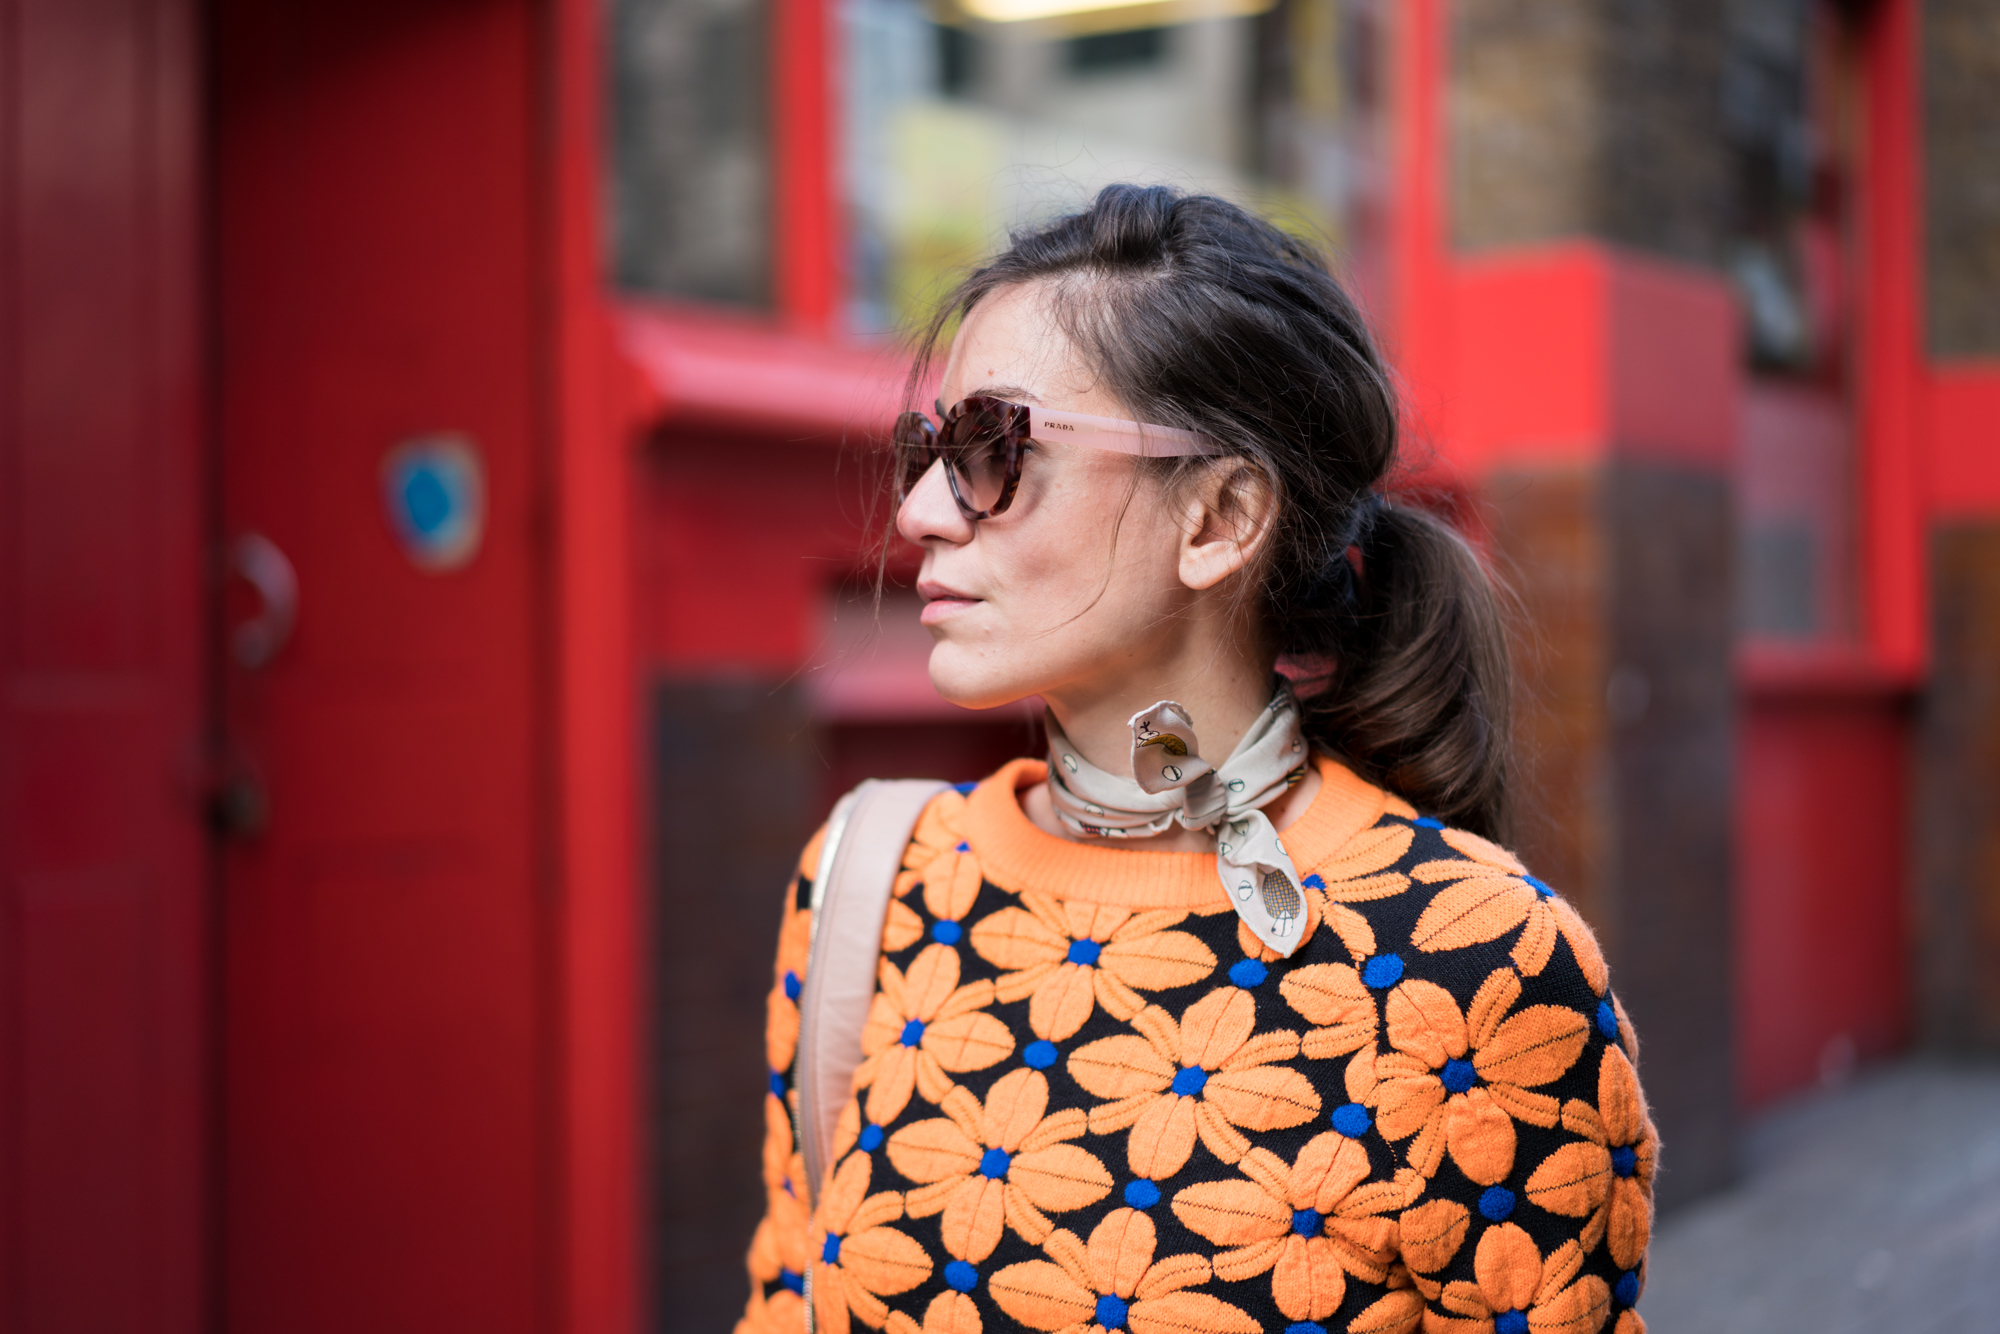 fw, street style, london fashion week, sunglass hut, style, fashion, turkish style blogger, billur saatci, off ne giysem, mybestfriends, fendi, loewe, prada, rumisu, carven, maison boinet, emma cook